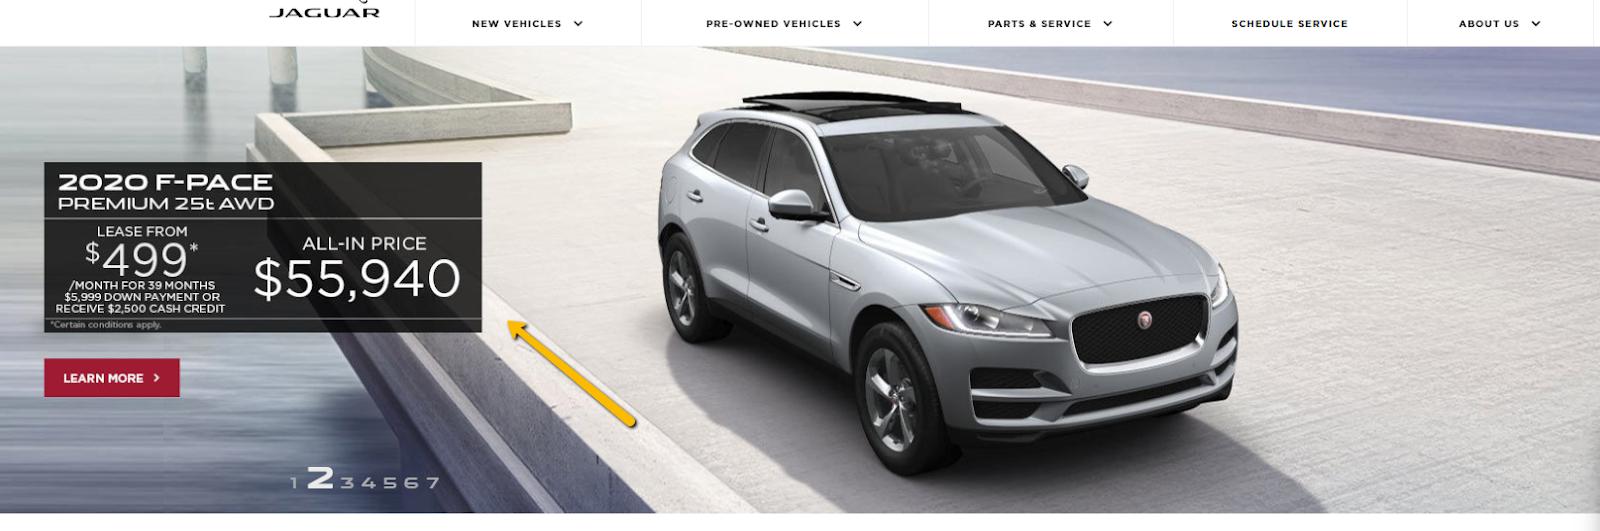 Jaguar Brand Guidleline vidceo creative